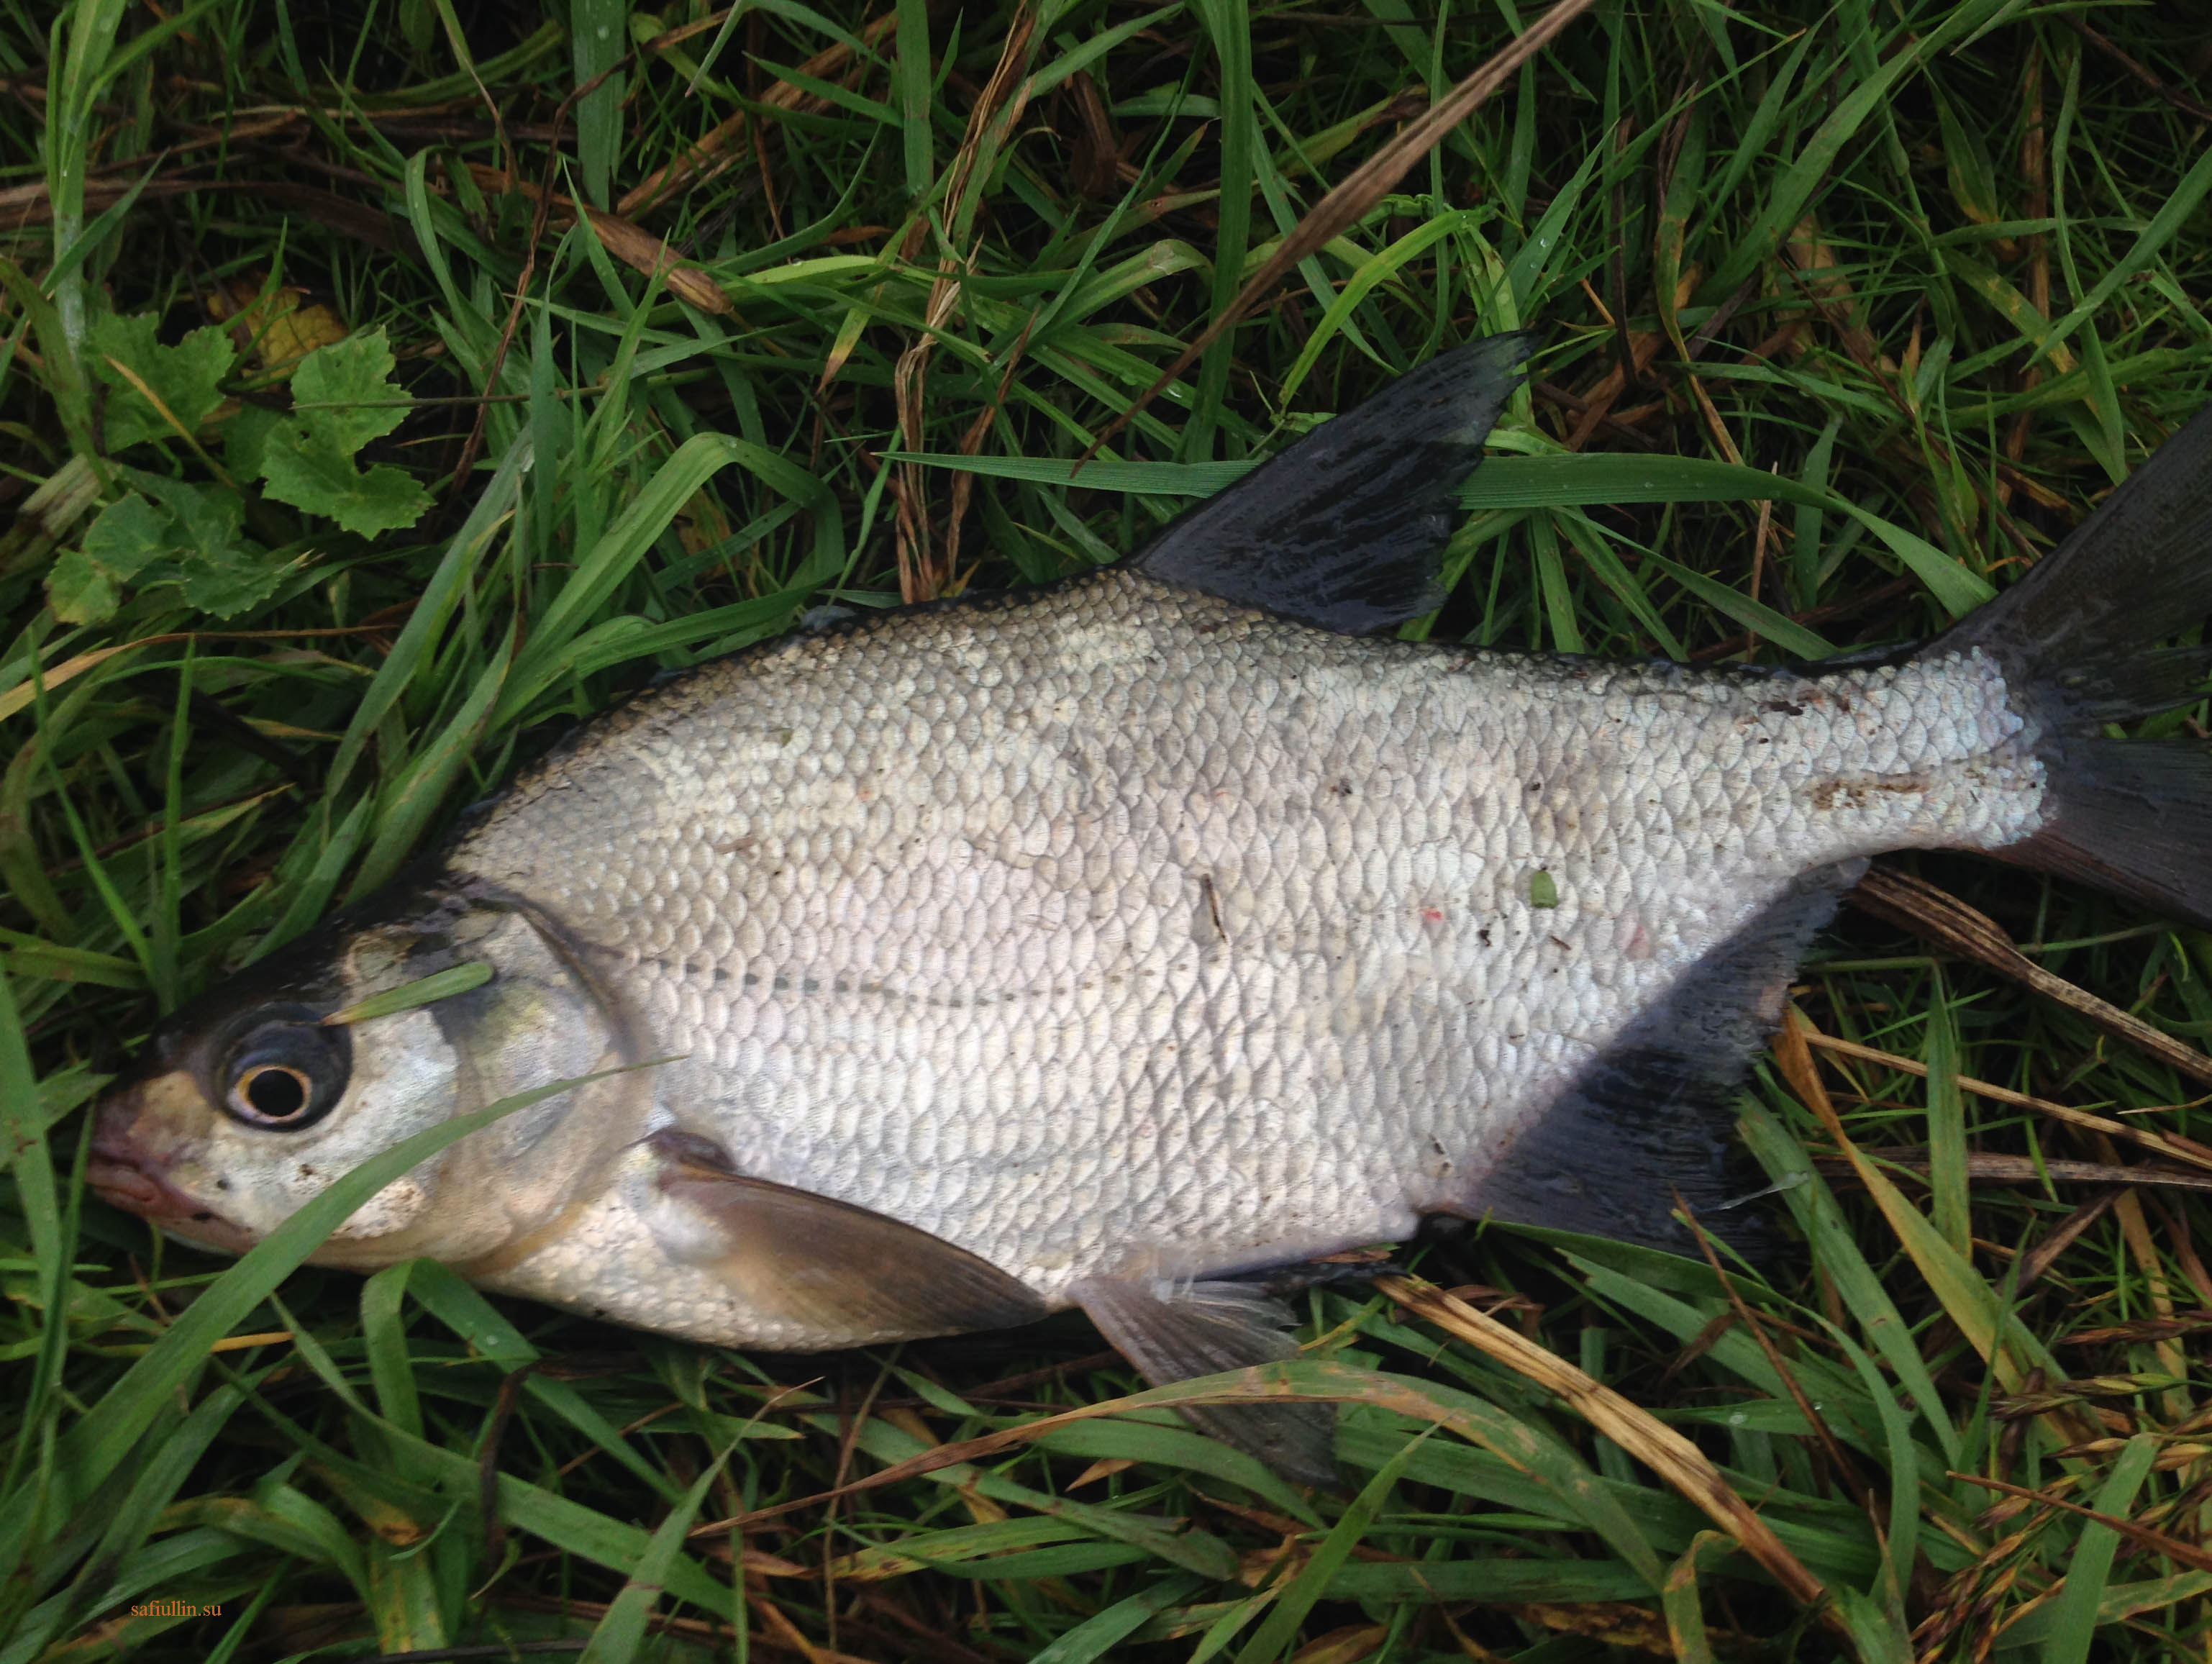 пейзажи природы альберт сафиуллин лето рыбалка лещ река лиелупе